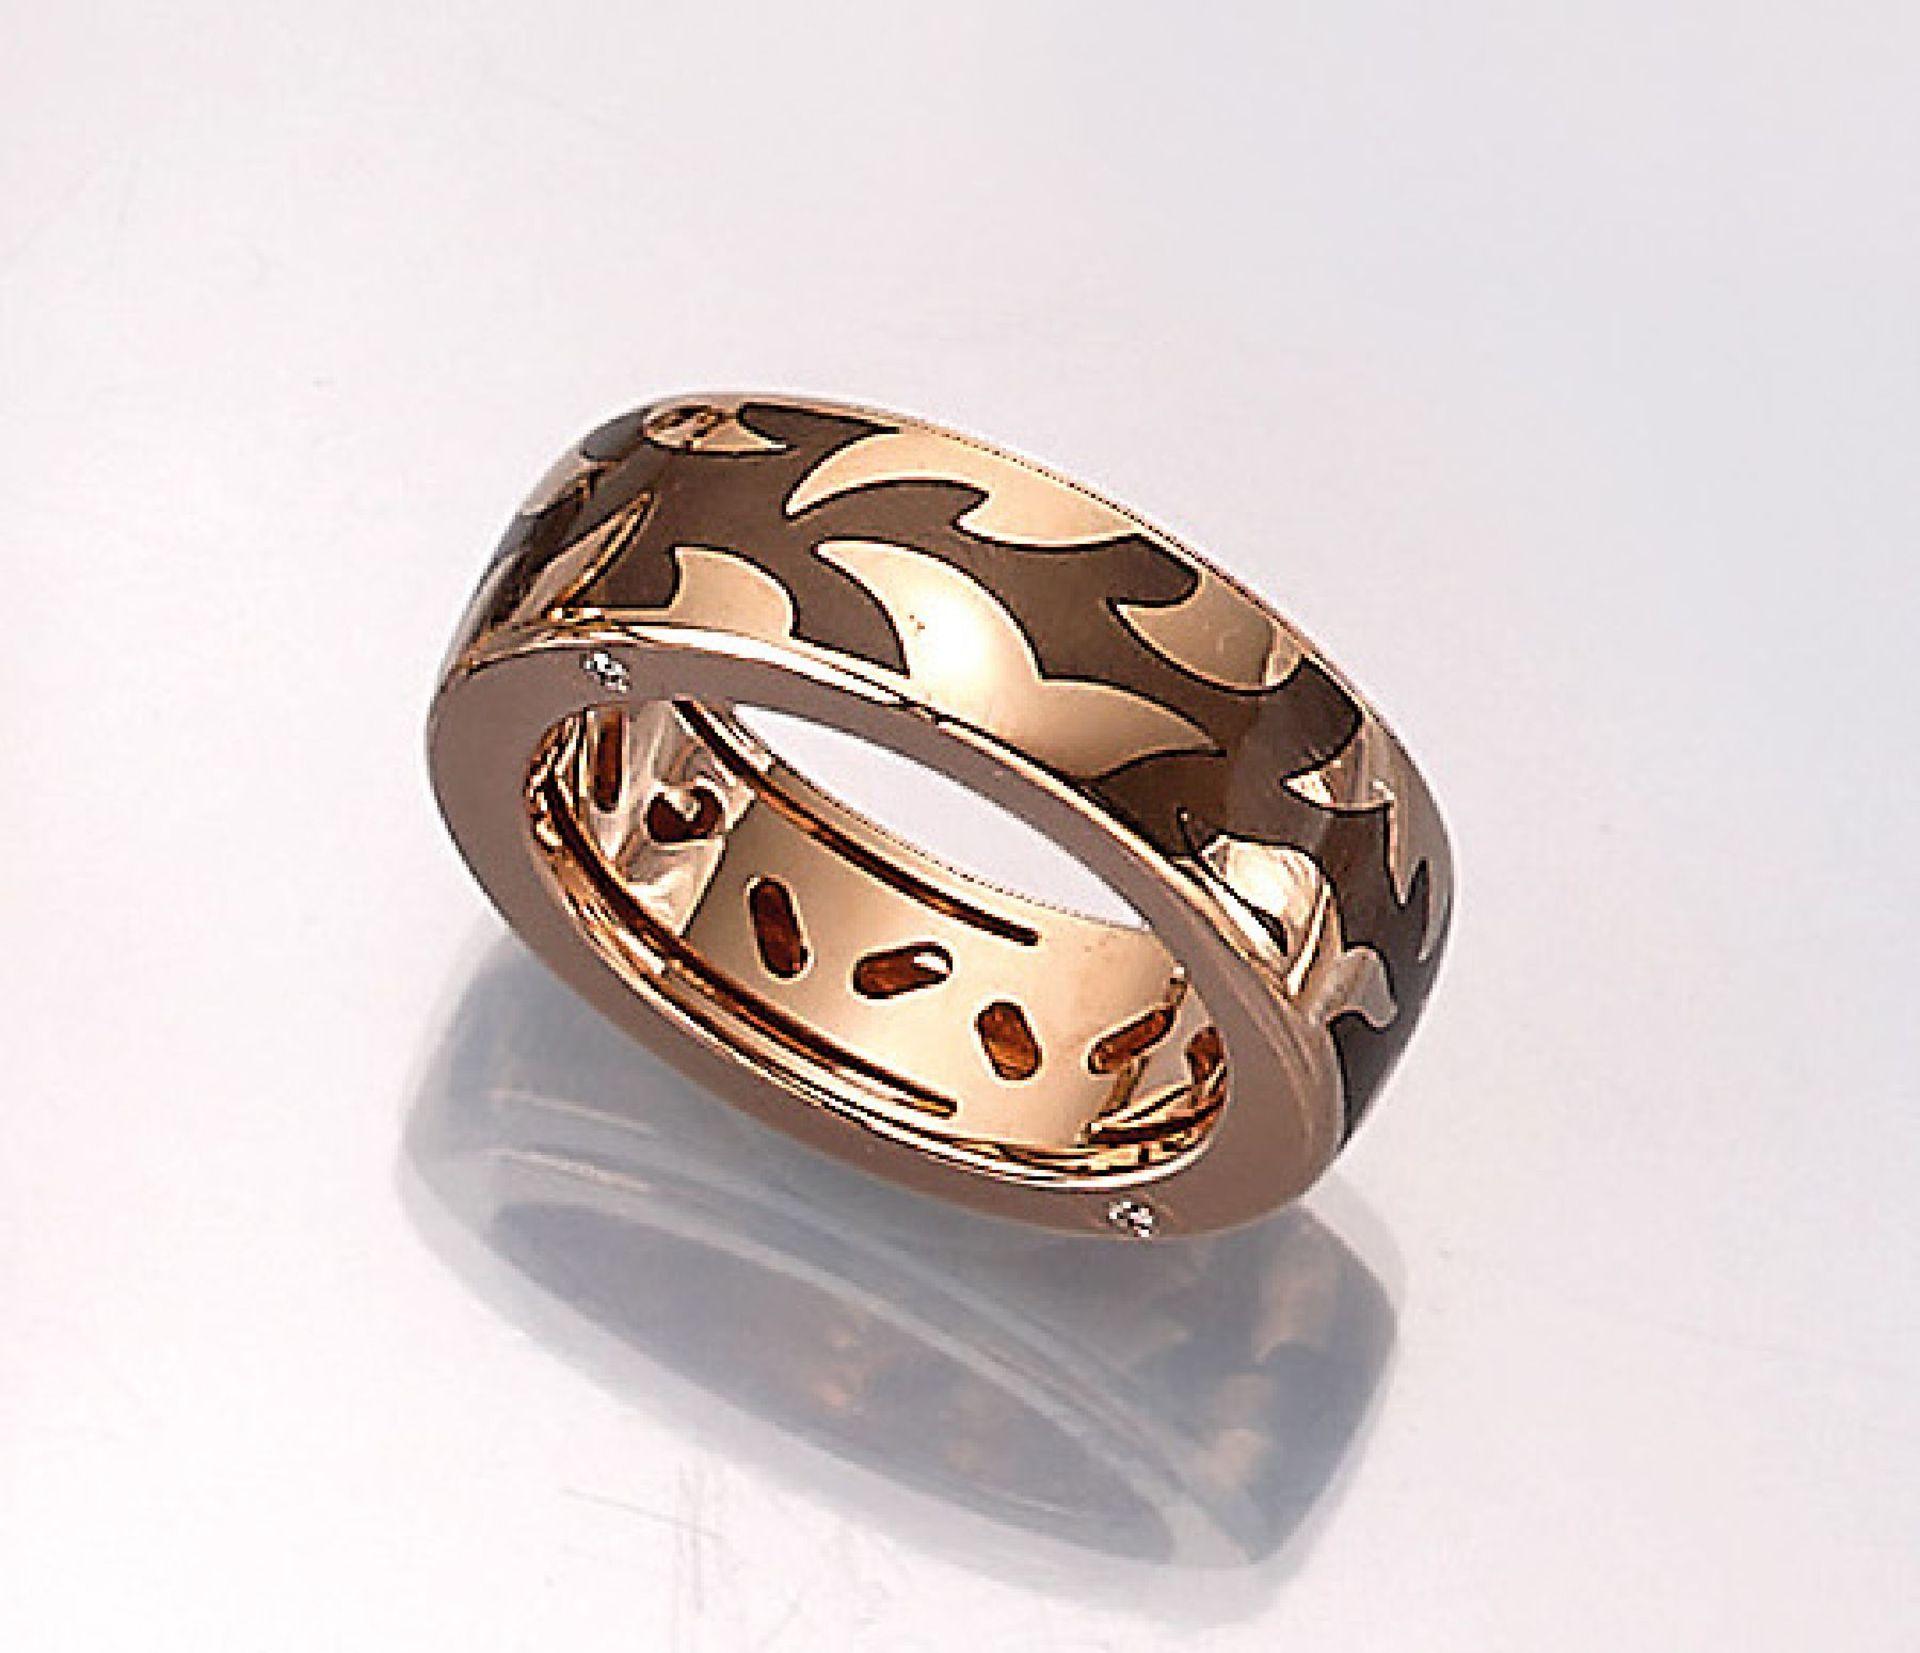 Los 61507 - 18 kt gold LEO WITTWER ring with enamel , RoseG 750/000, brown translucent enameled, 4 brilliants